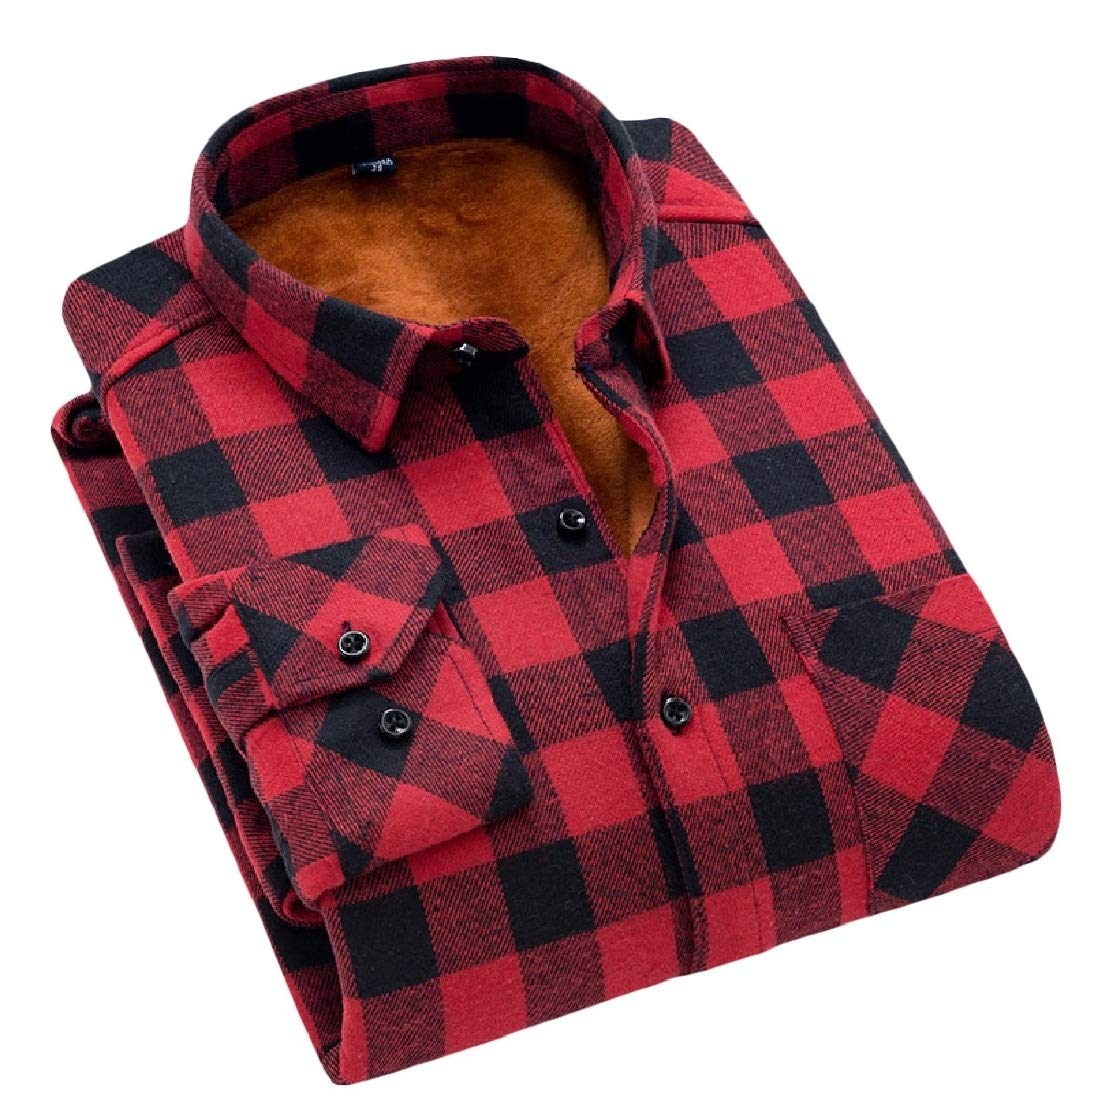 YUNY Mens Plaid Pattern Keep Warm Casual Thick Fall Winter Flannel Dress Shirts AS3 XL